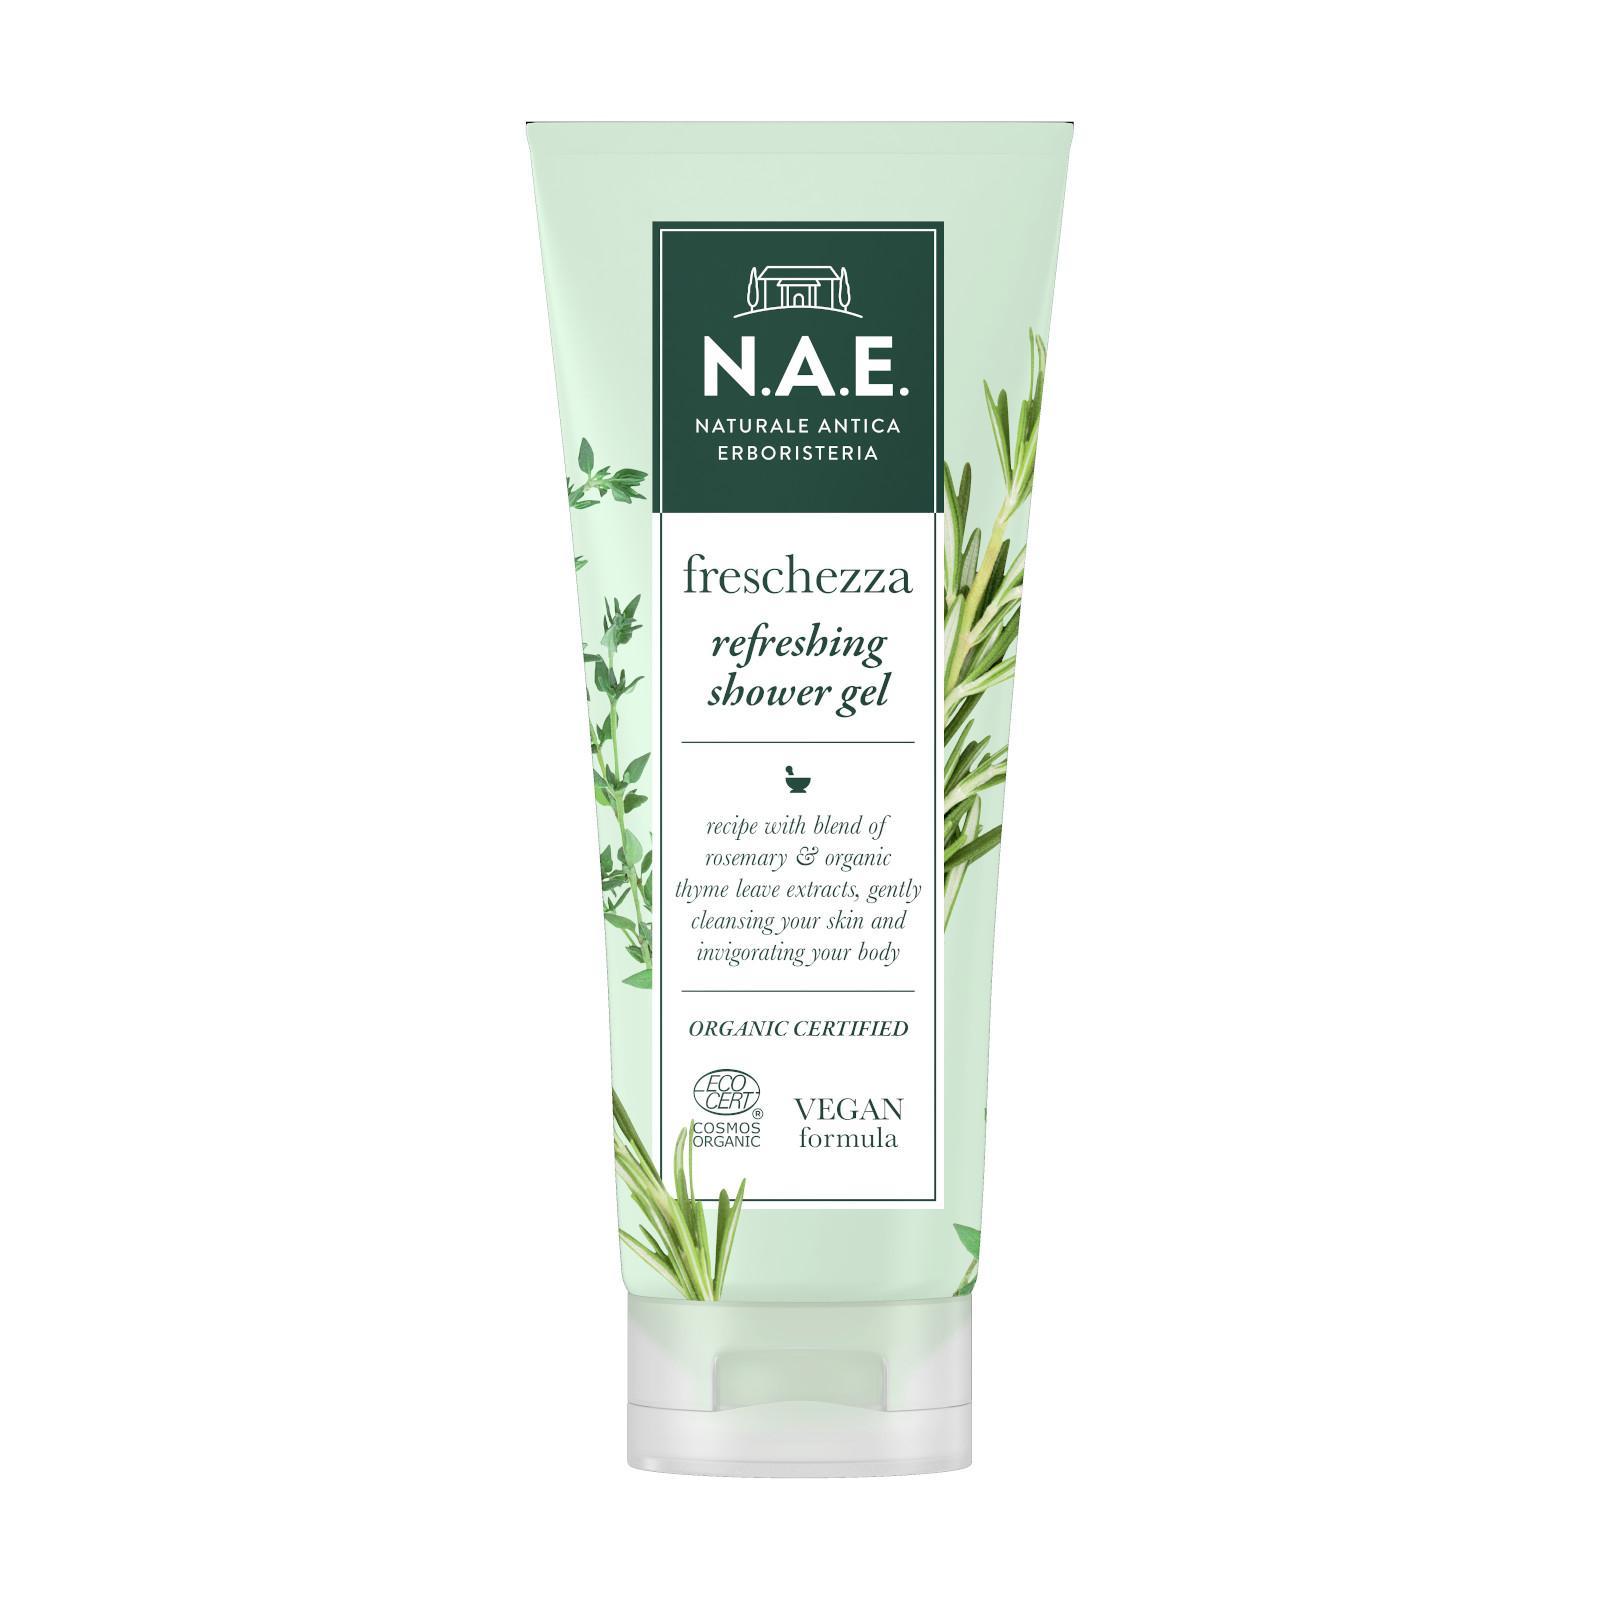 N.A.E. Freschezza sprchový gel 200 ml